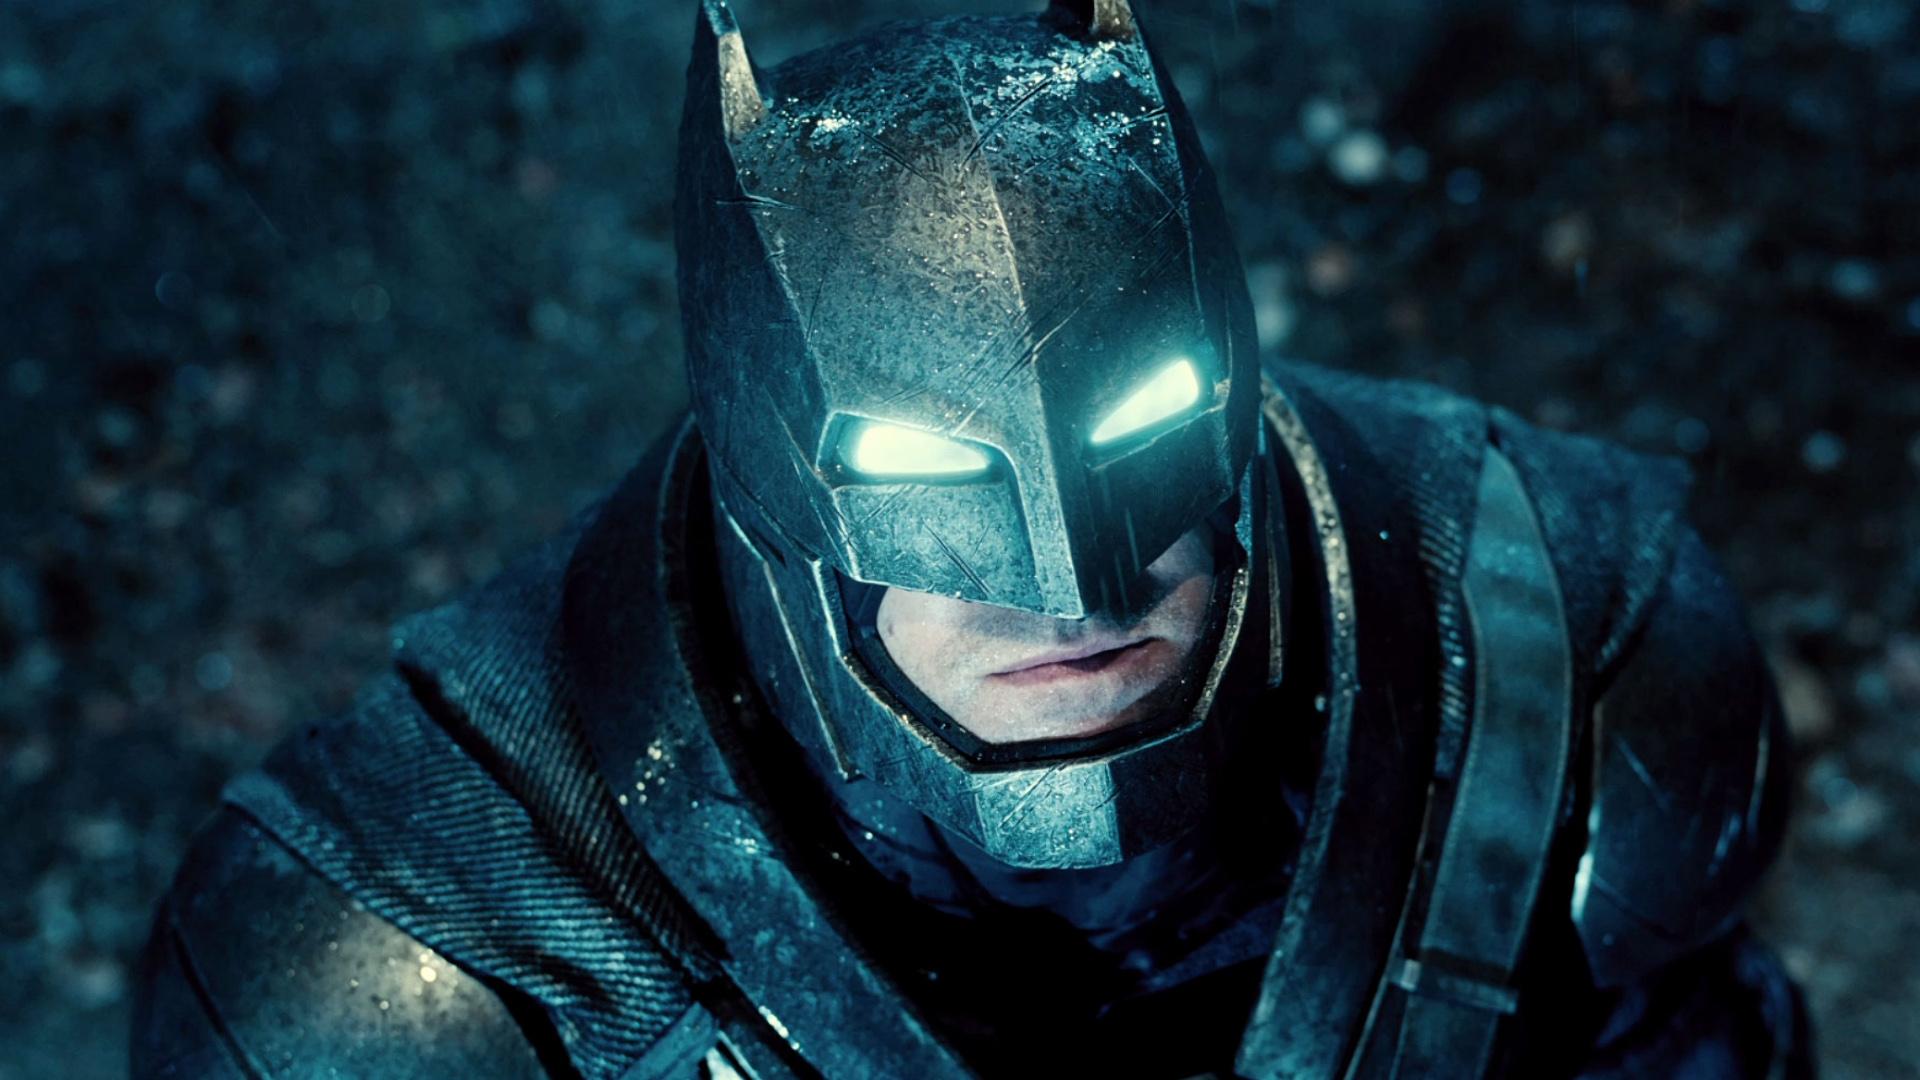 Batman Metal Armour in Batman v Superman Dawn of Justice Wallpaper 1920x1080